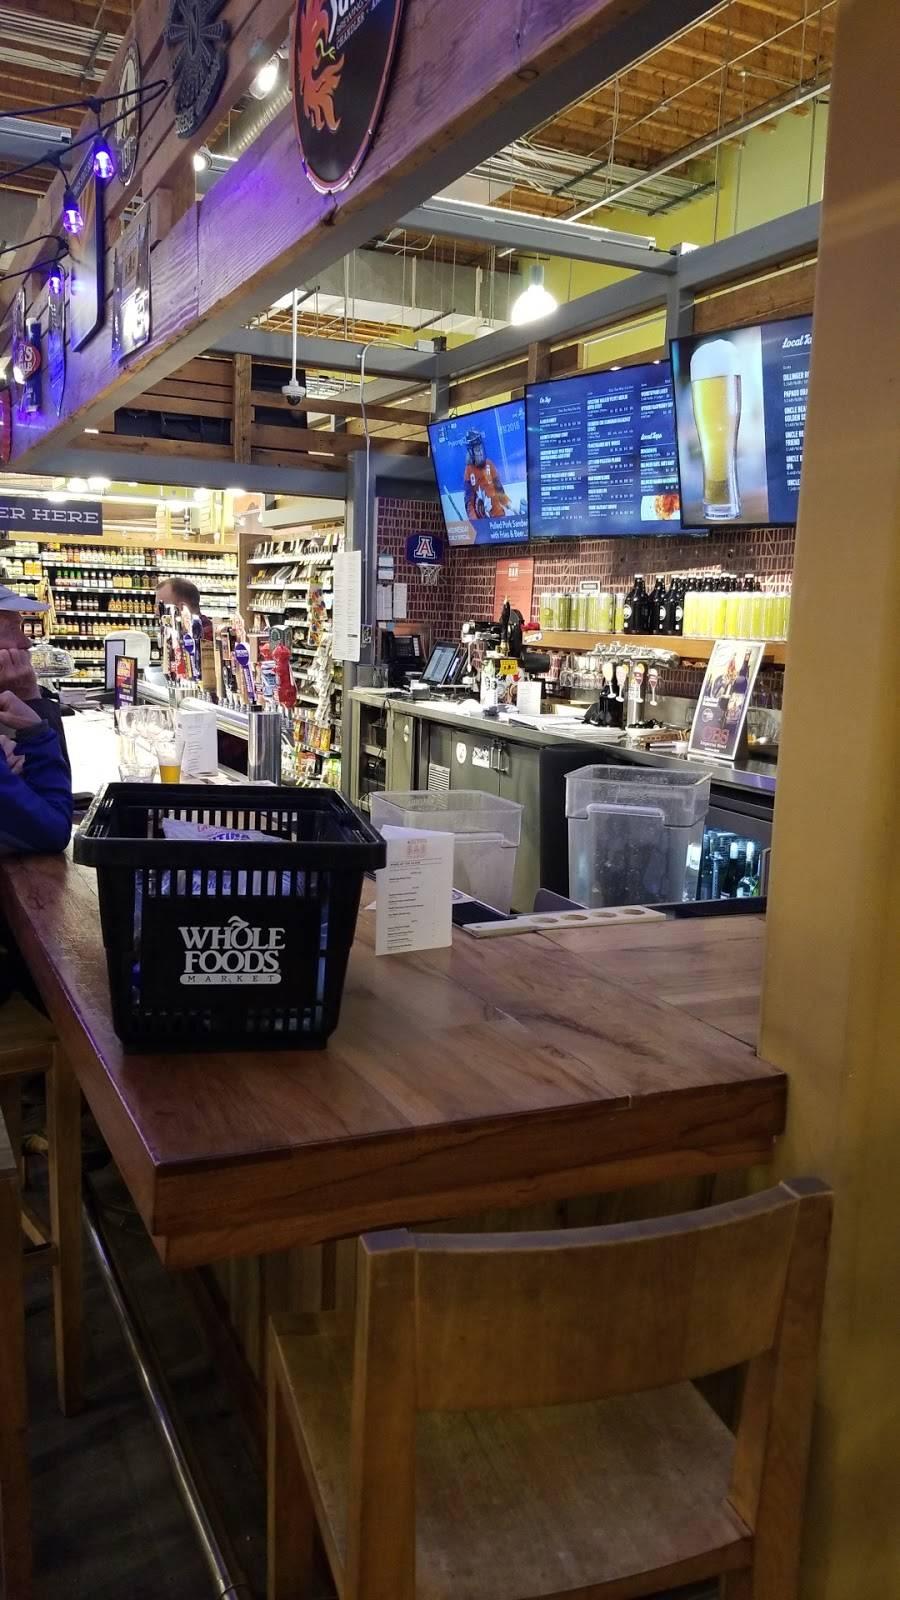 Whole Foods Market - supermarket  | Photo 9 of 10 | Address: 5555 E River Rd, Tucson, AZ 85750, USA | Phone: (520) 461-1300